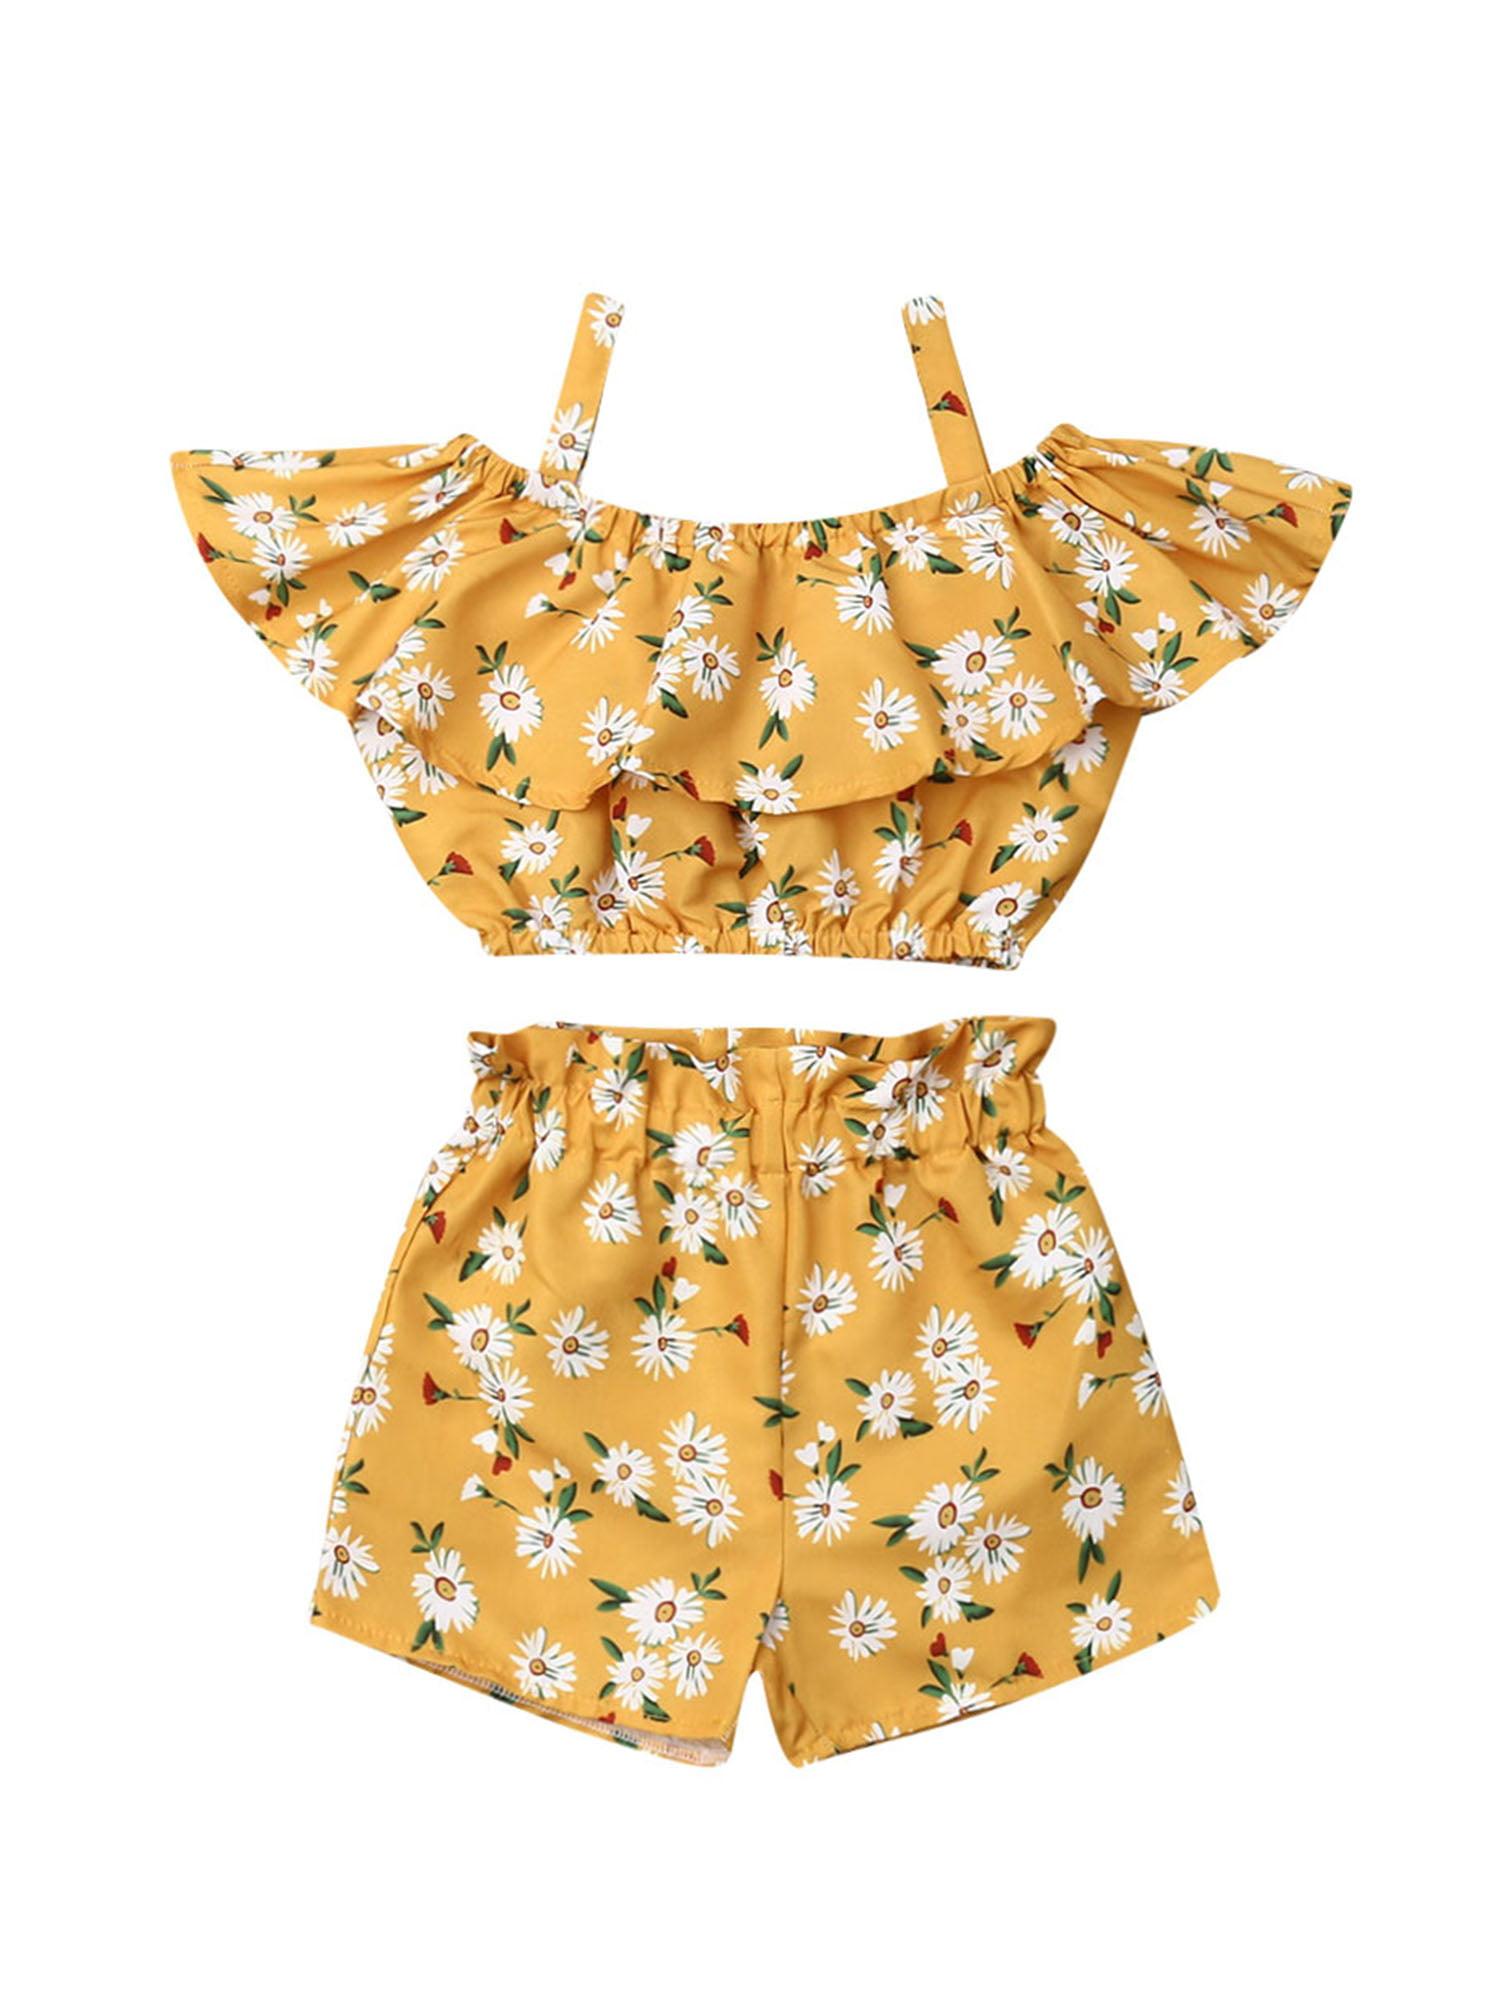 MOVEmen Baby Girls Sleeveless Fruits Lemon Print Tube Tops+Shorts Outfits Leisure Sling T-Shirt for Travel Beach